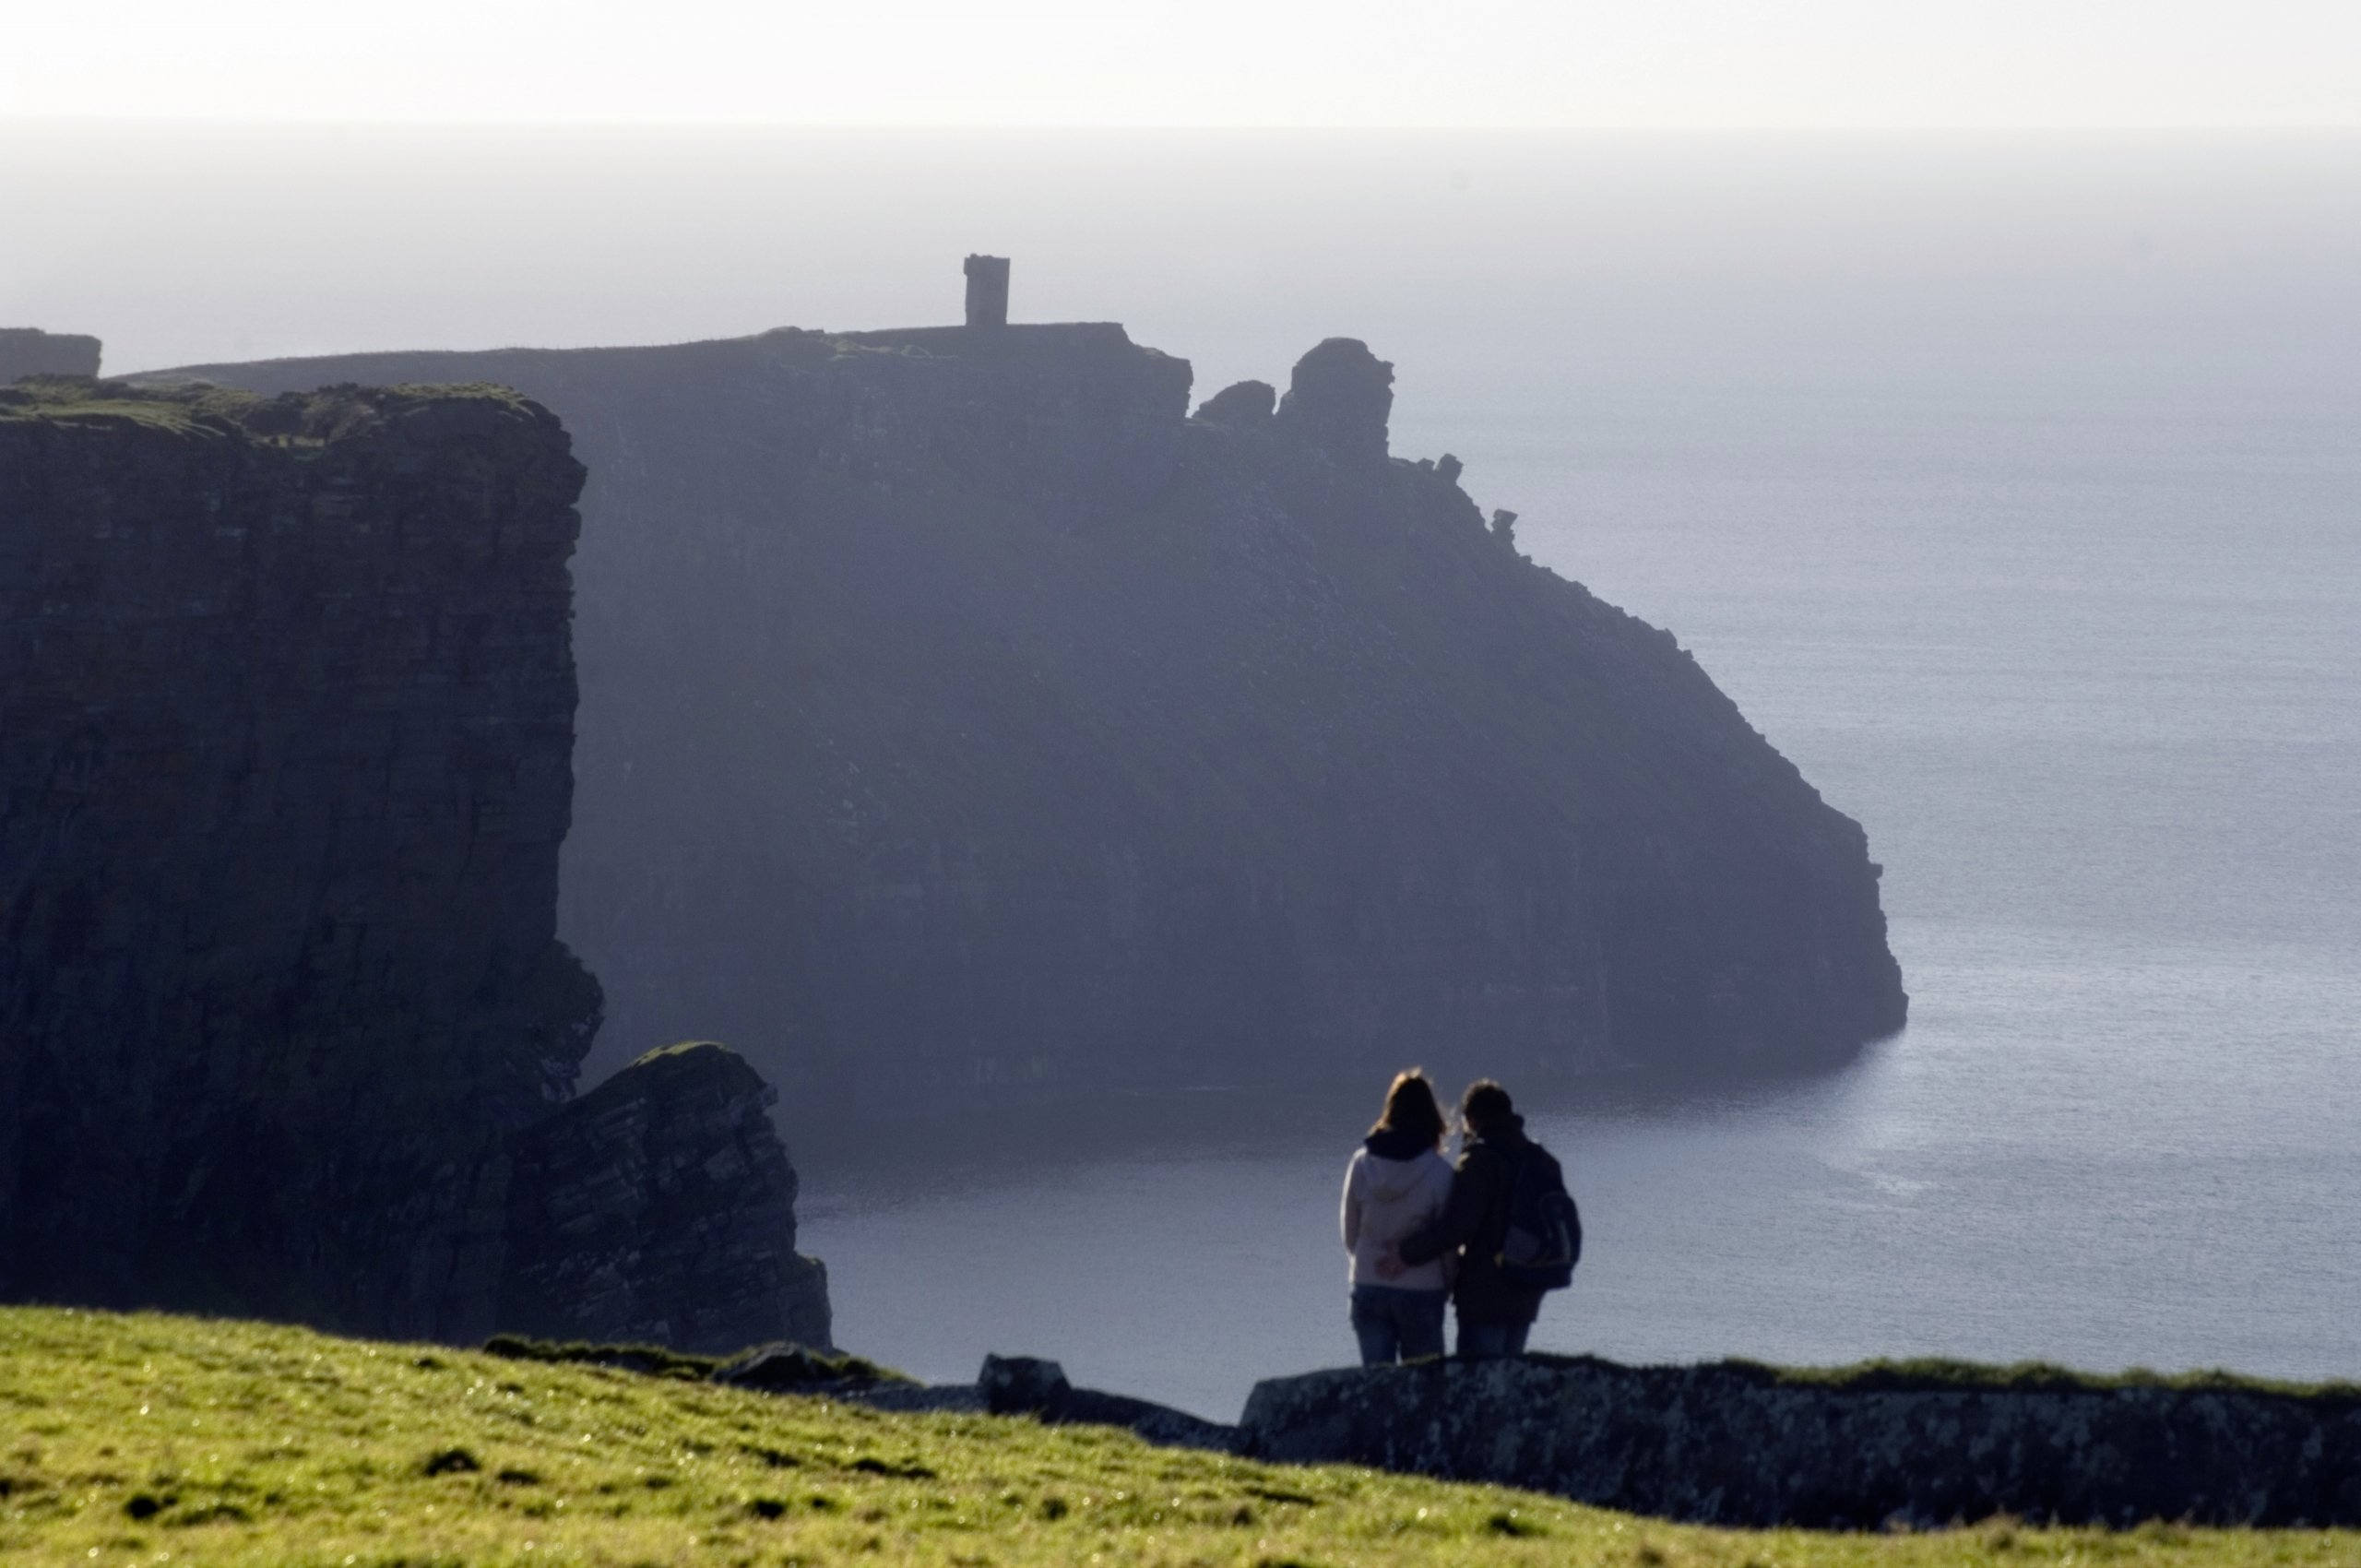 The Burren, Aran Islands & Connemara 8 Day Hike/Self Guide